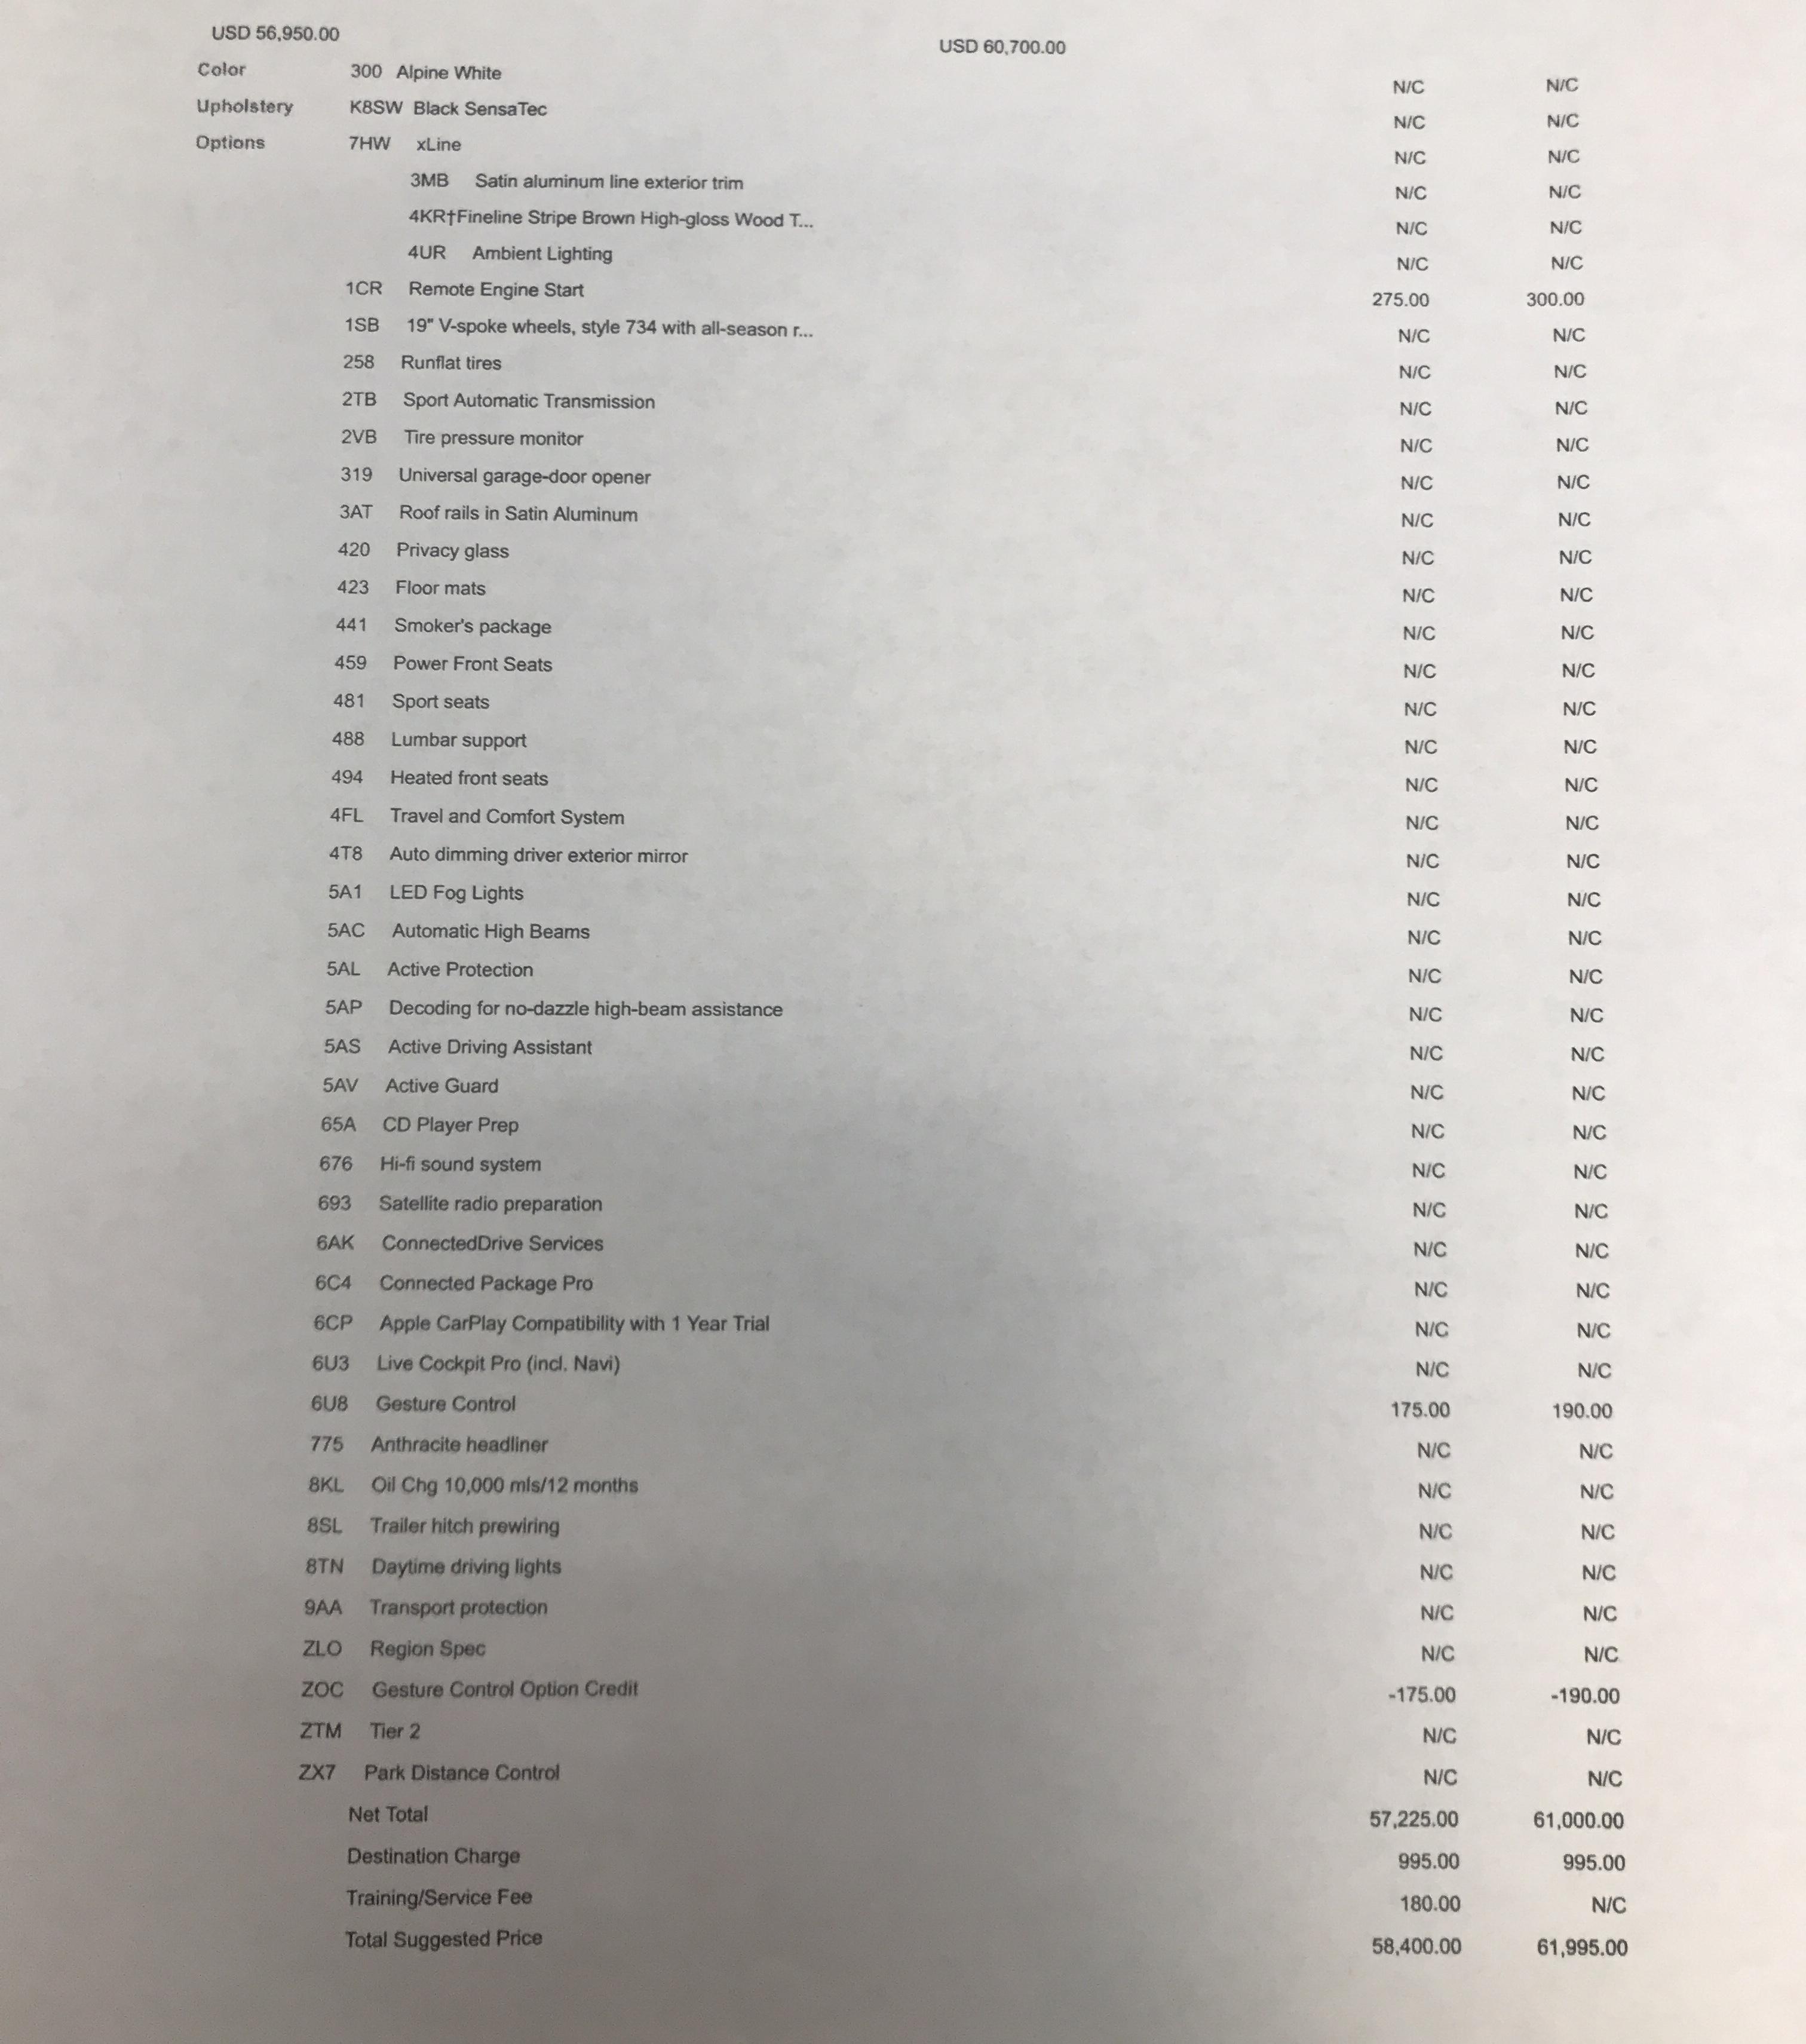 2019 BMW X5 $604/month Demo. Taxes, DMV, Bank, 1st Month